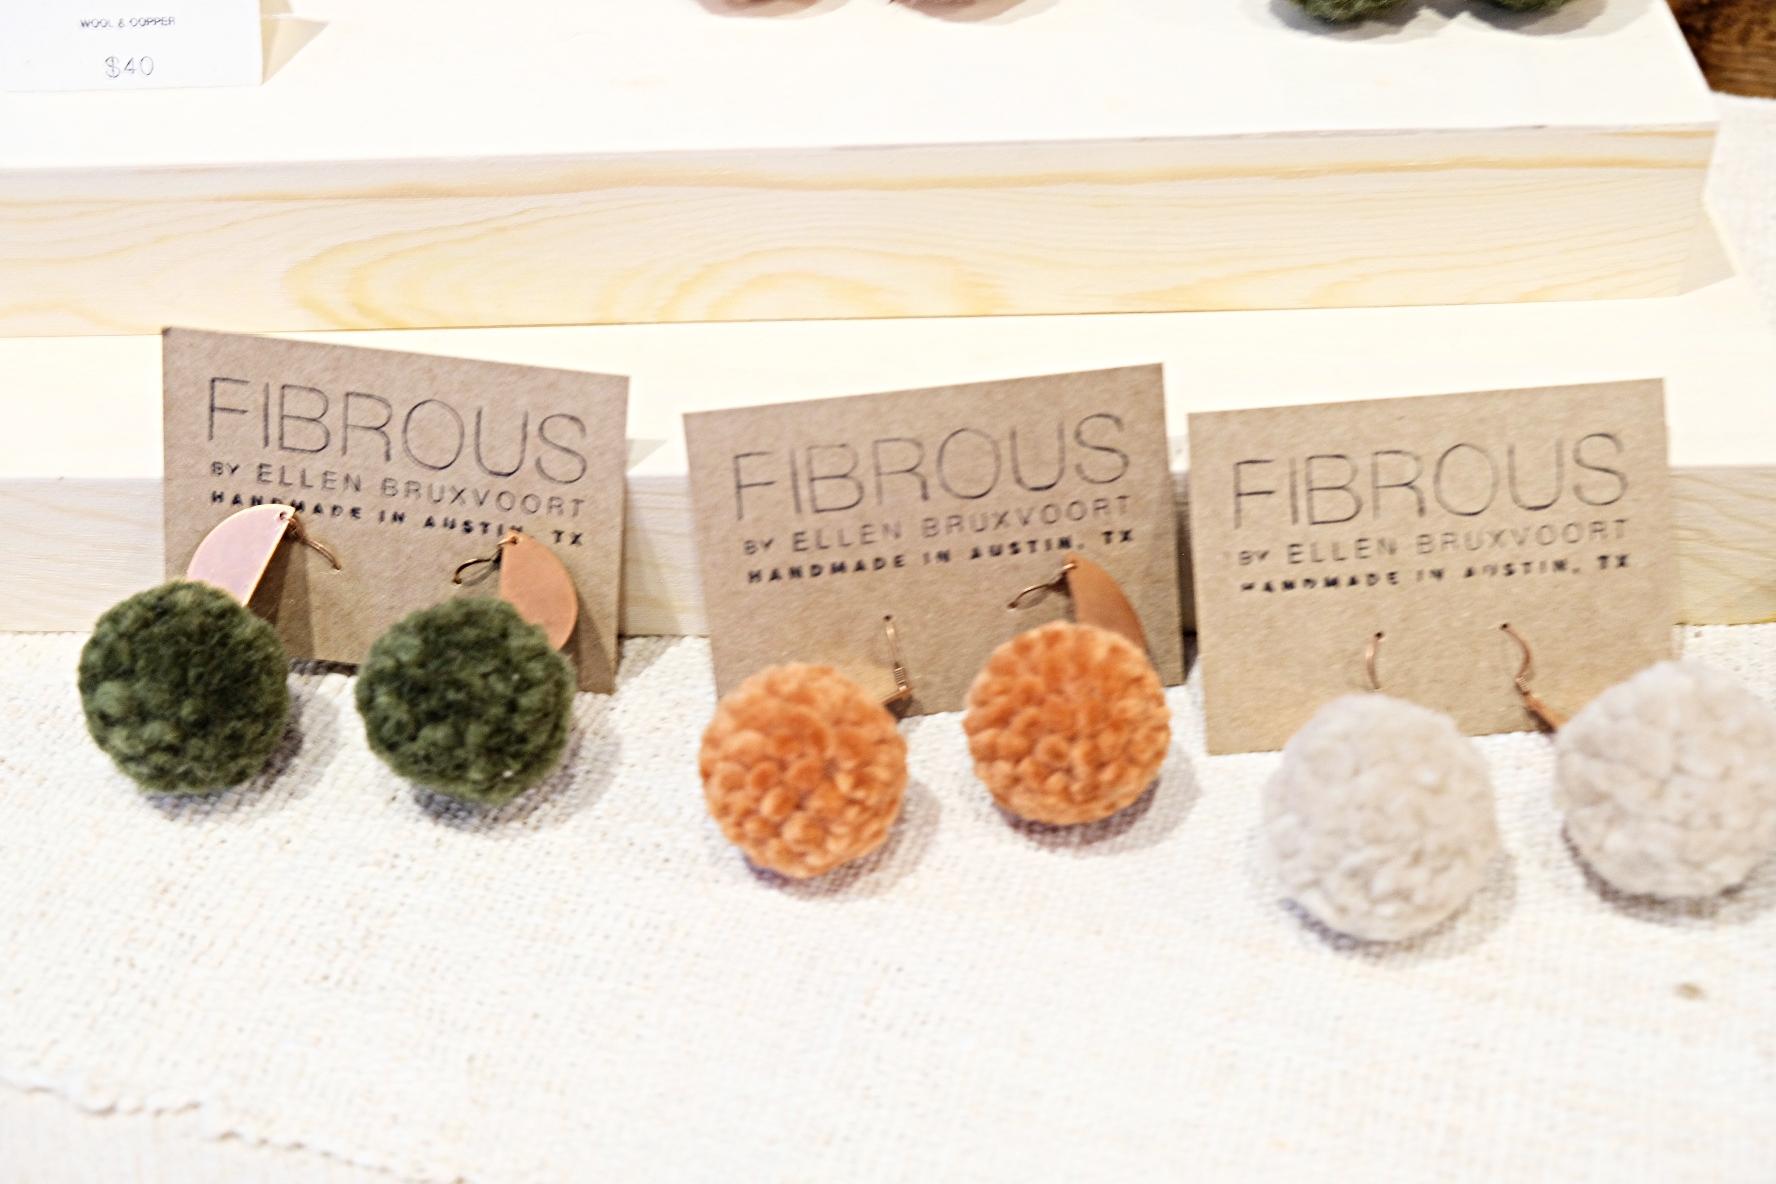 fibrous1